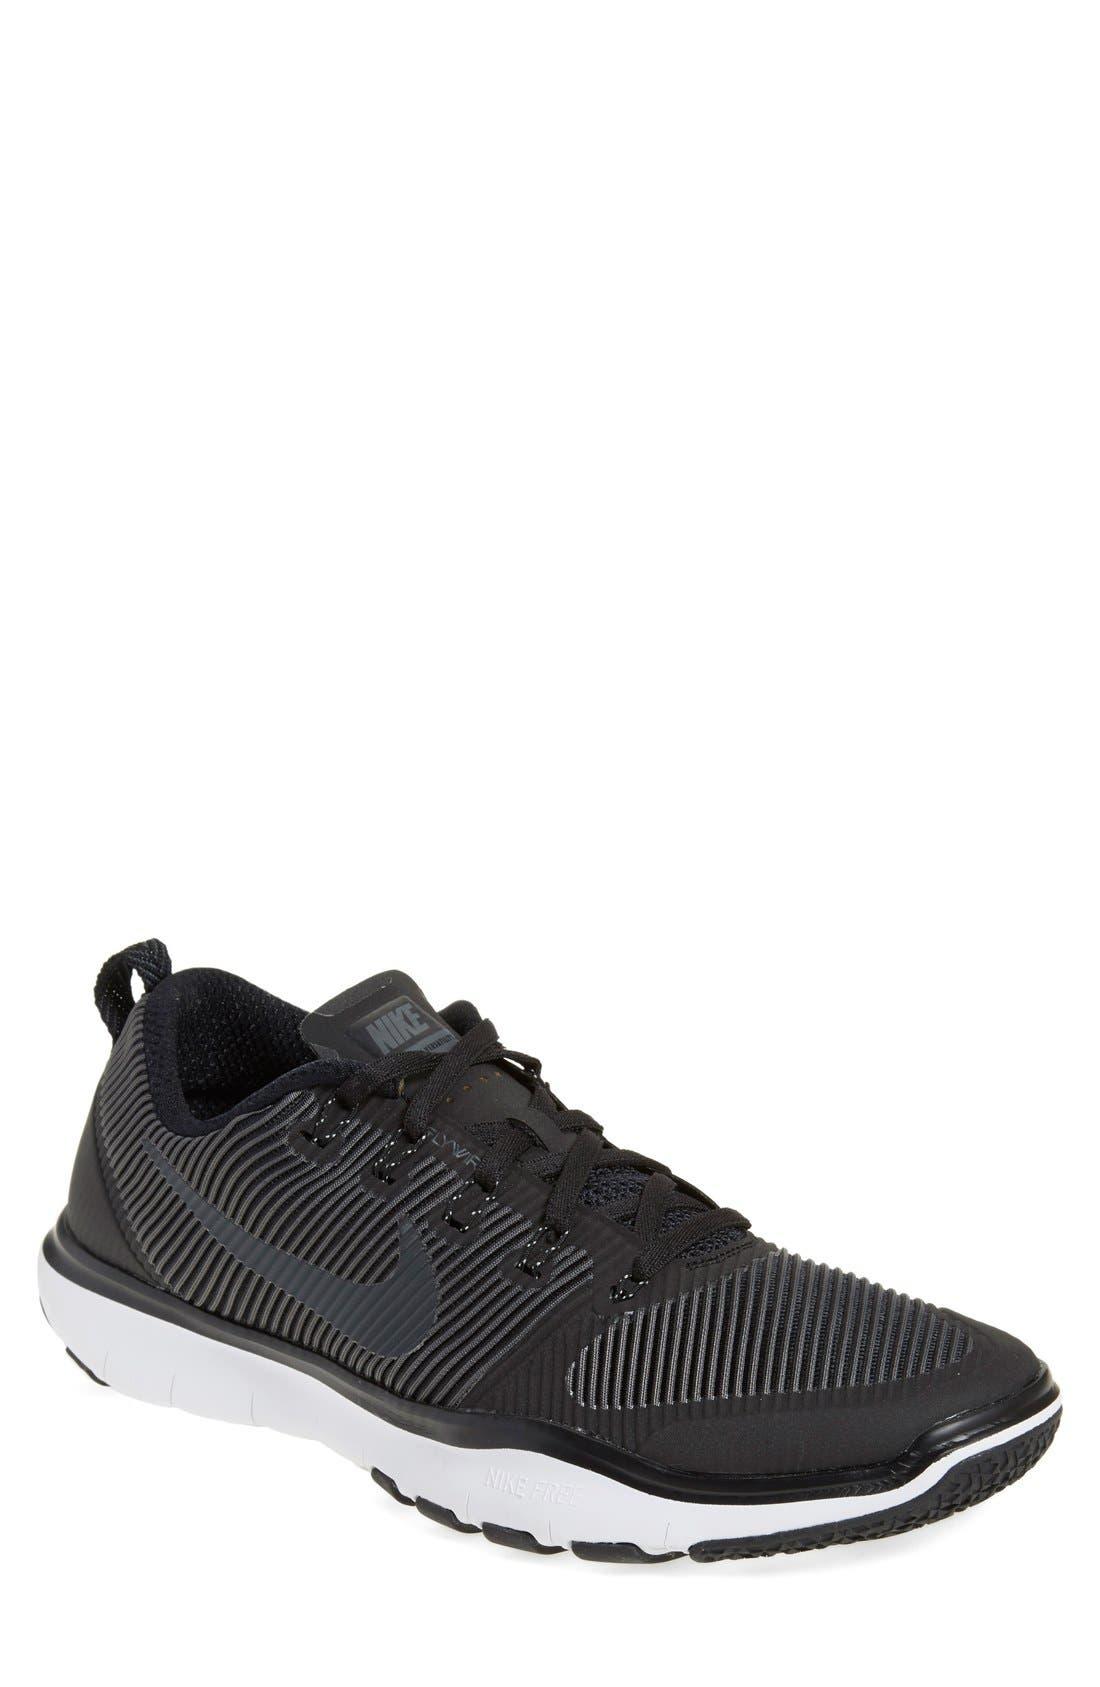 Alternate Image 1 Selected - Nike 'Free Train Versatility' Training Shoe (Men)